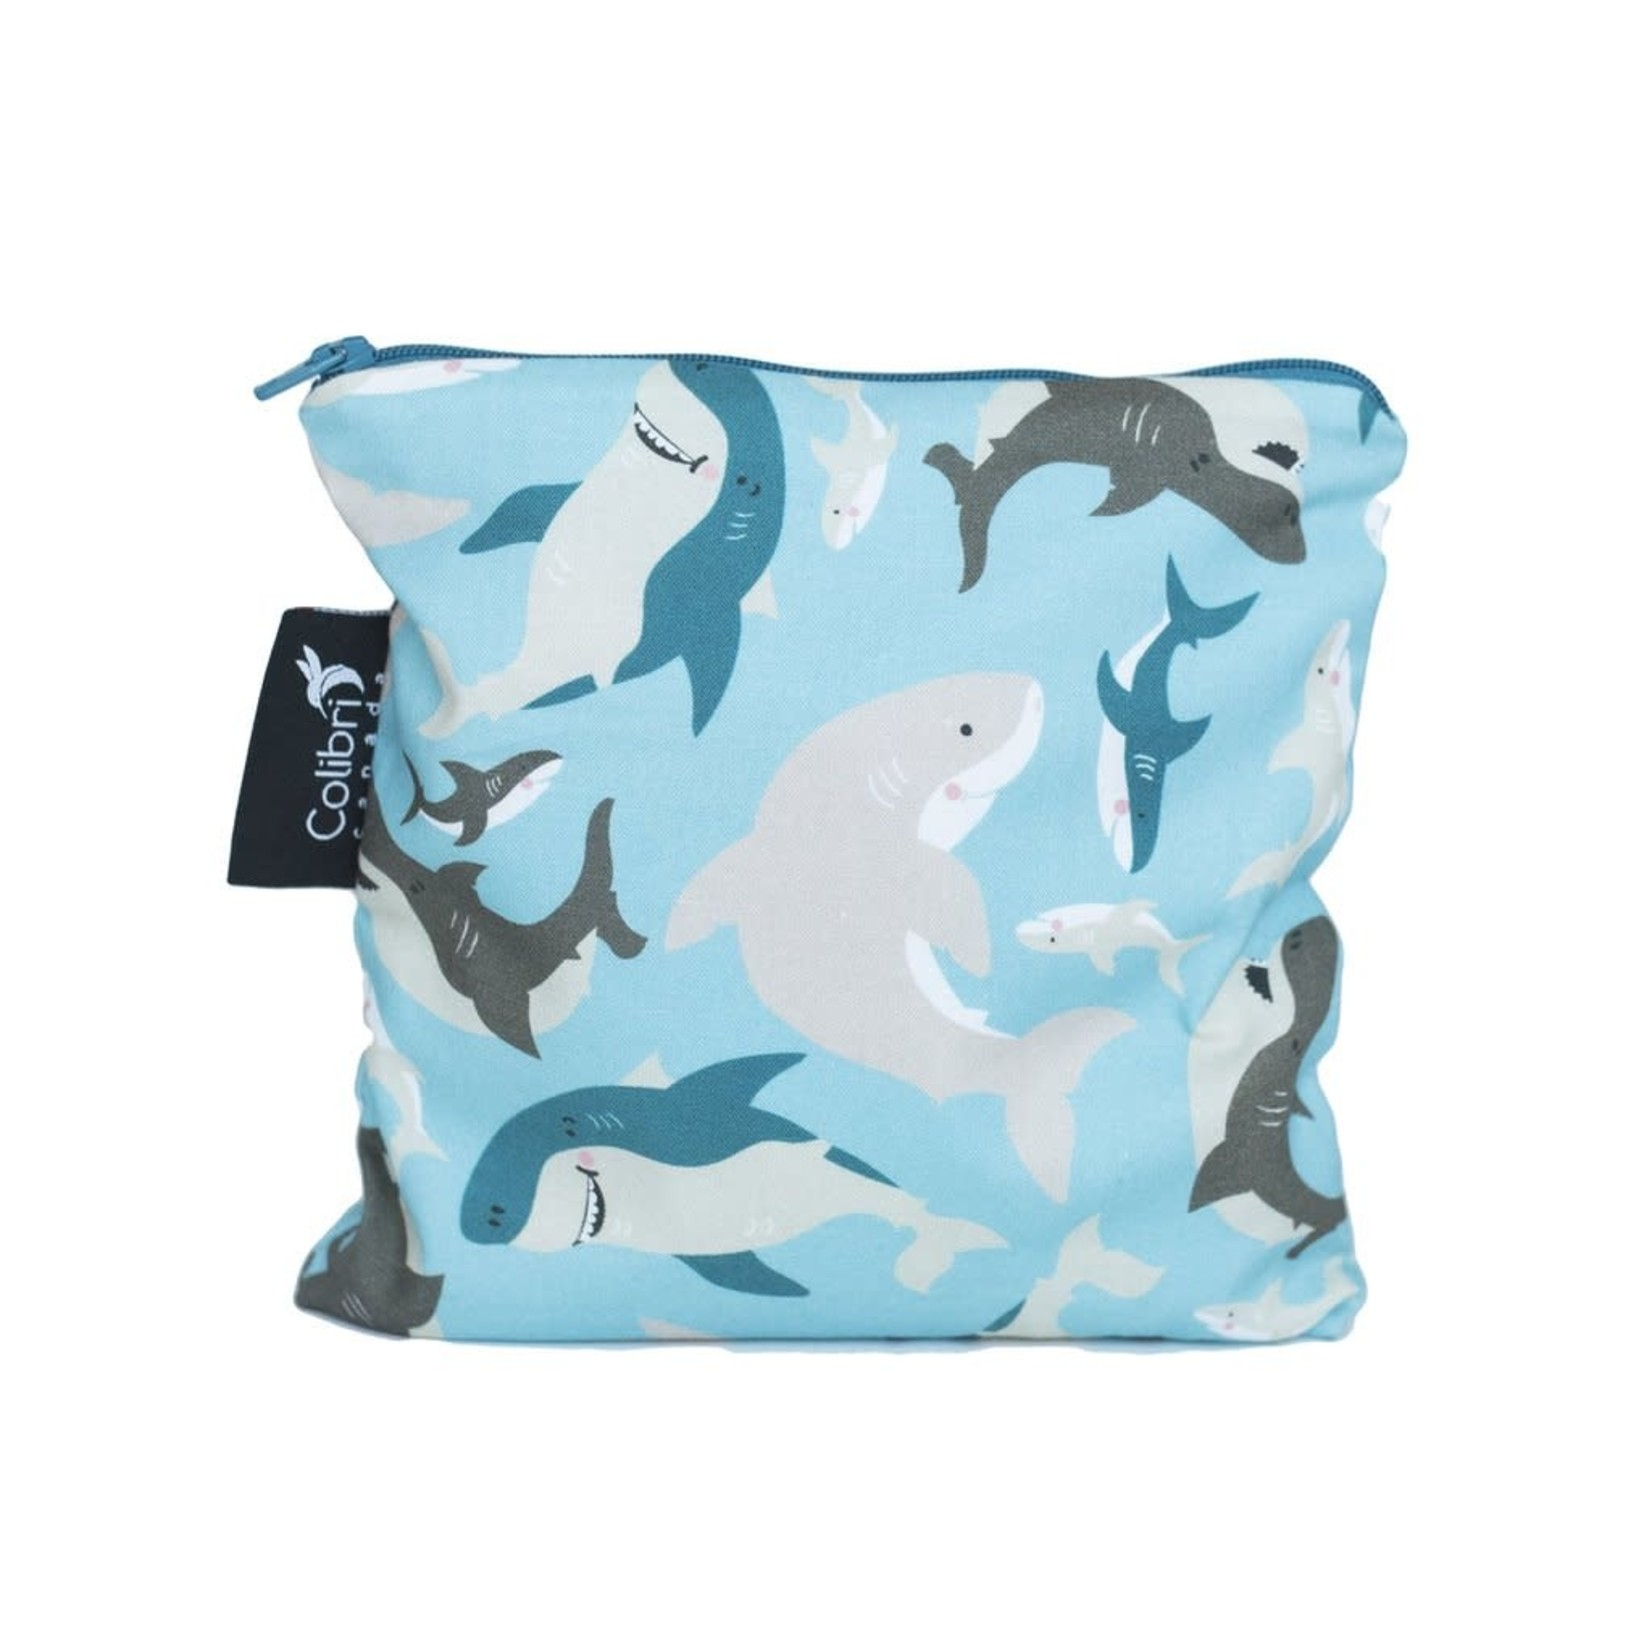 REUSABLE SNACK BAGS - SHARKS